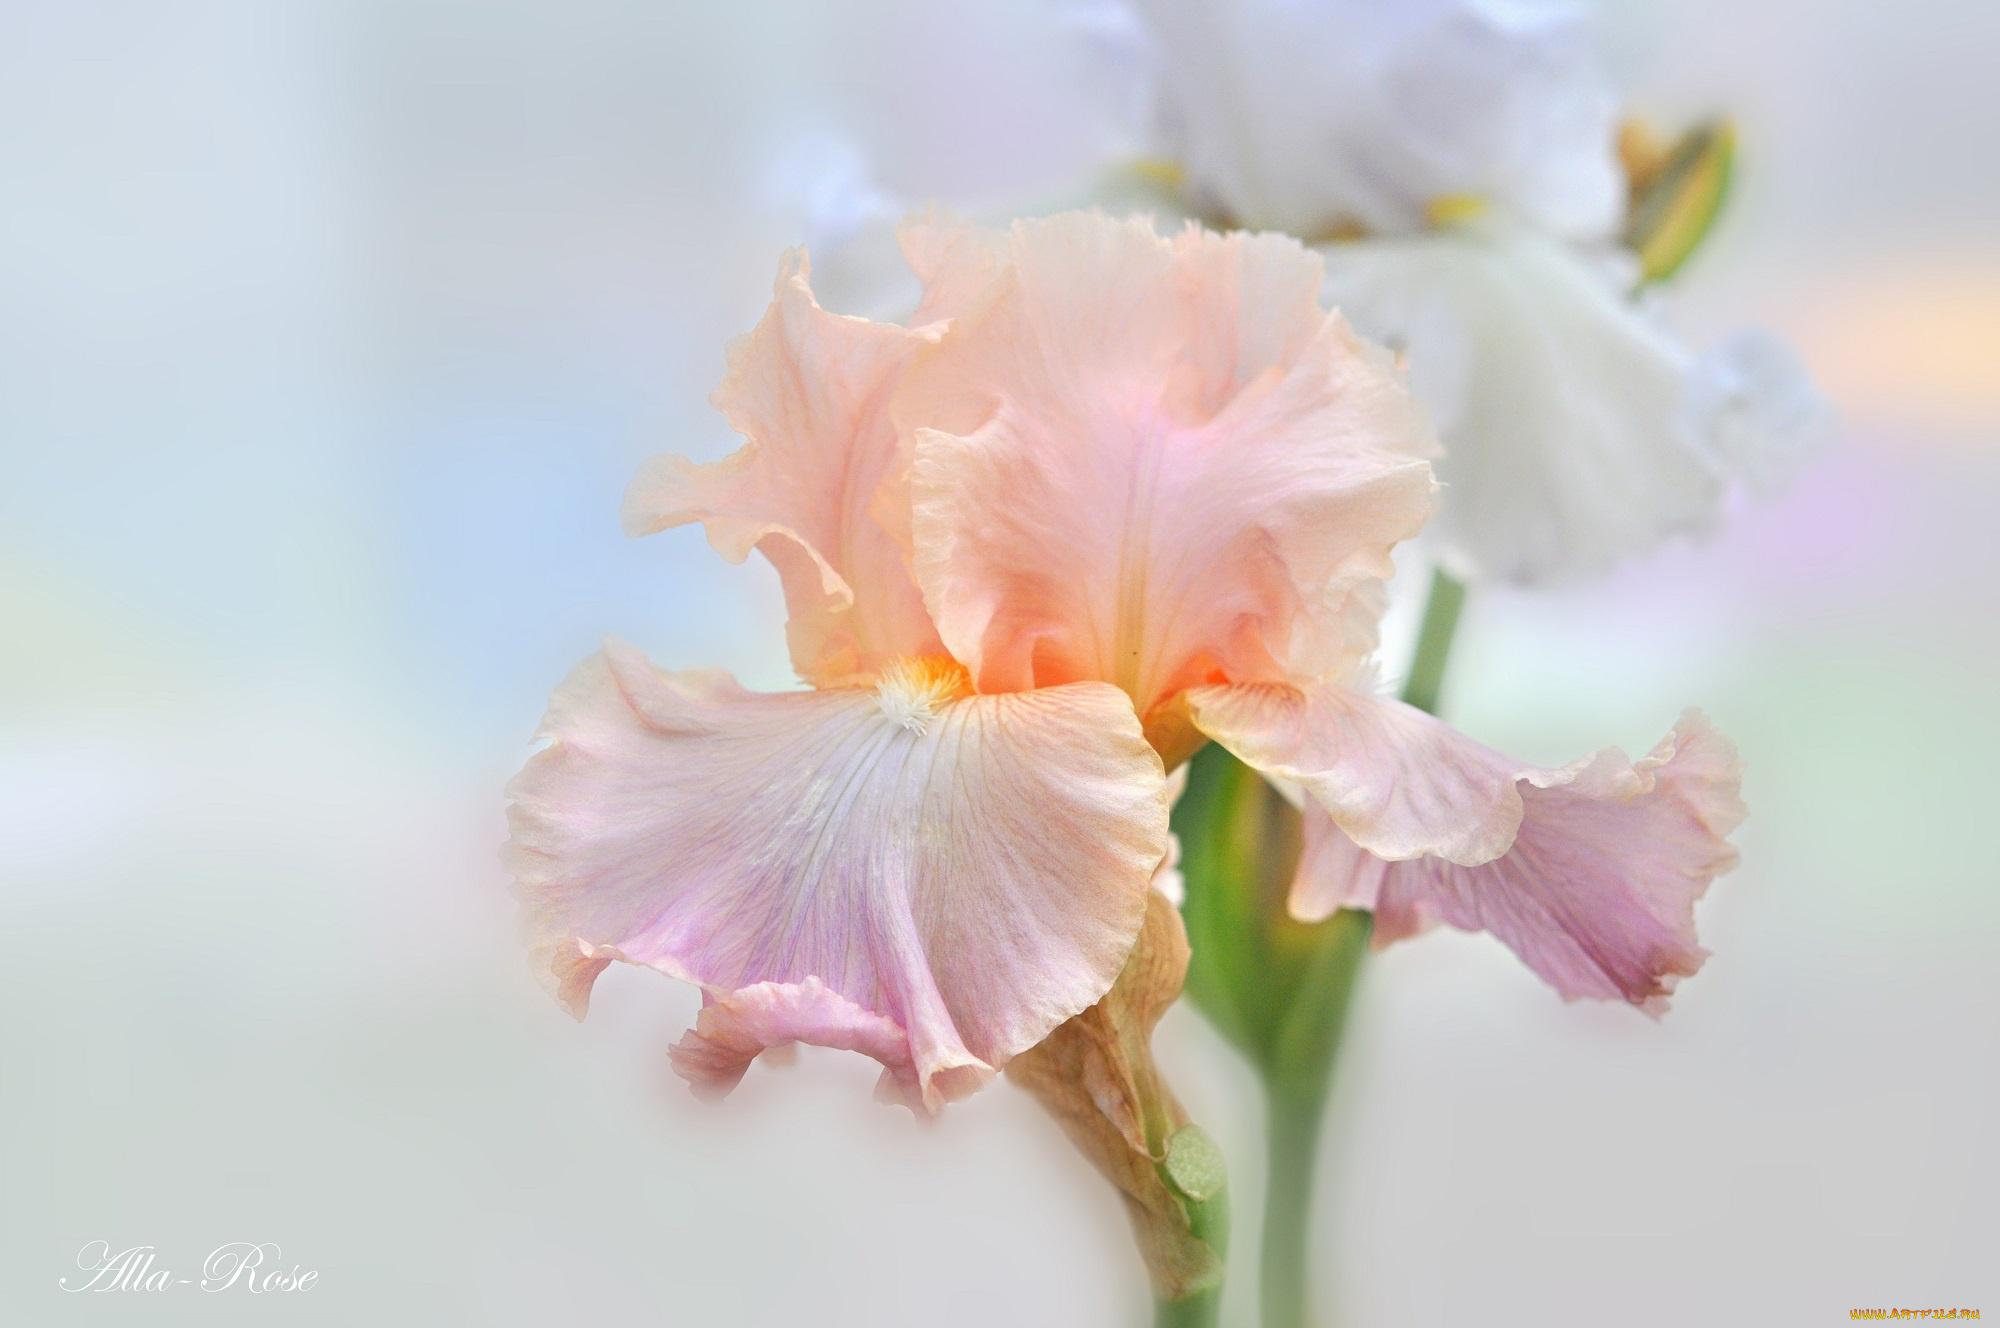 шмель,ирис,цветок,лето  № 529551 бесплатно